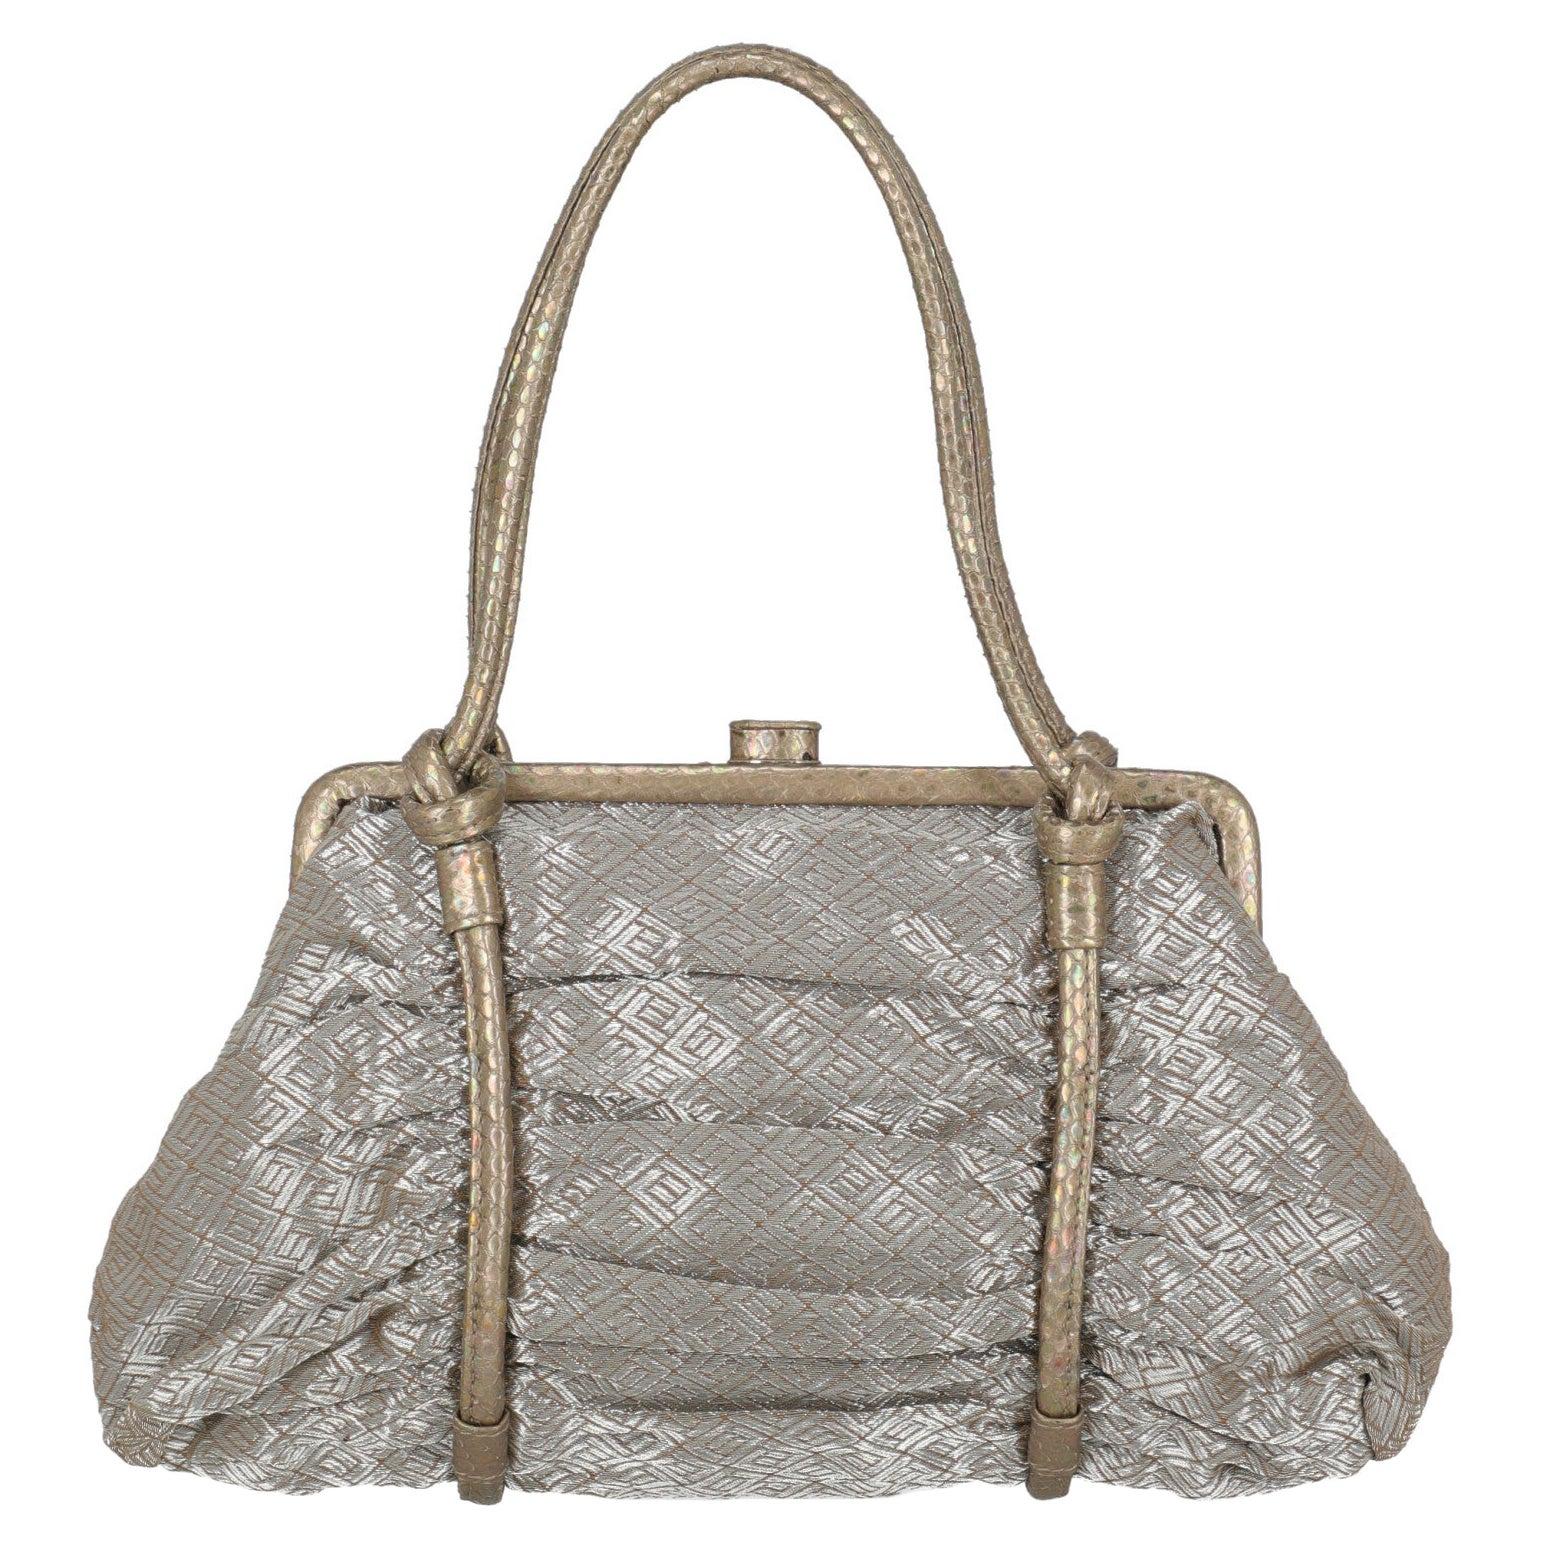 Bottega Veneta Women Handbags Gold, Silver Fabric